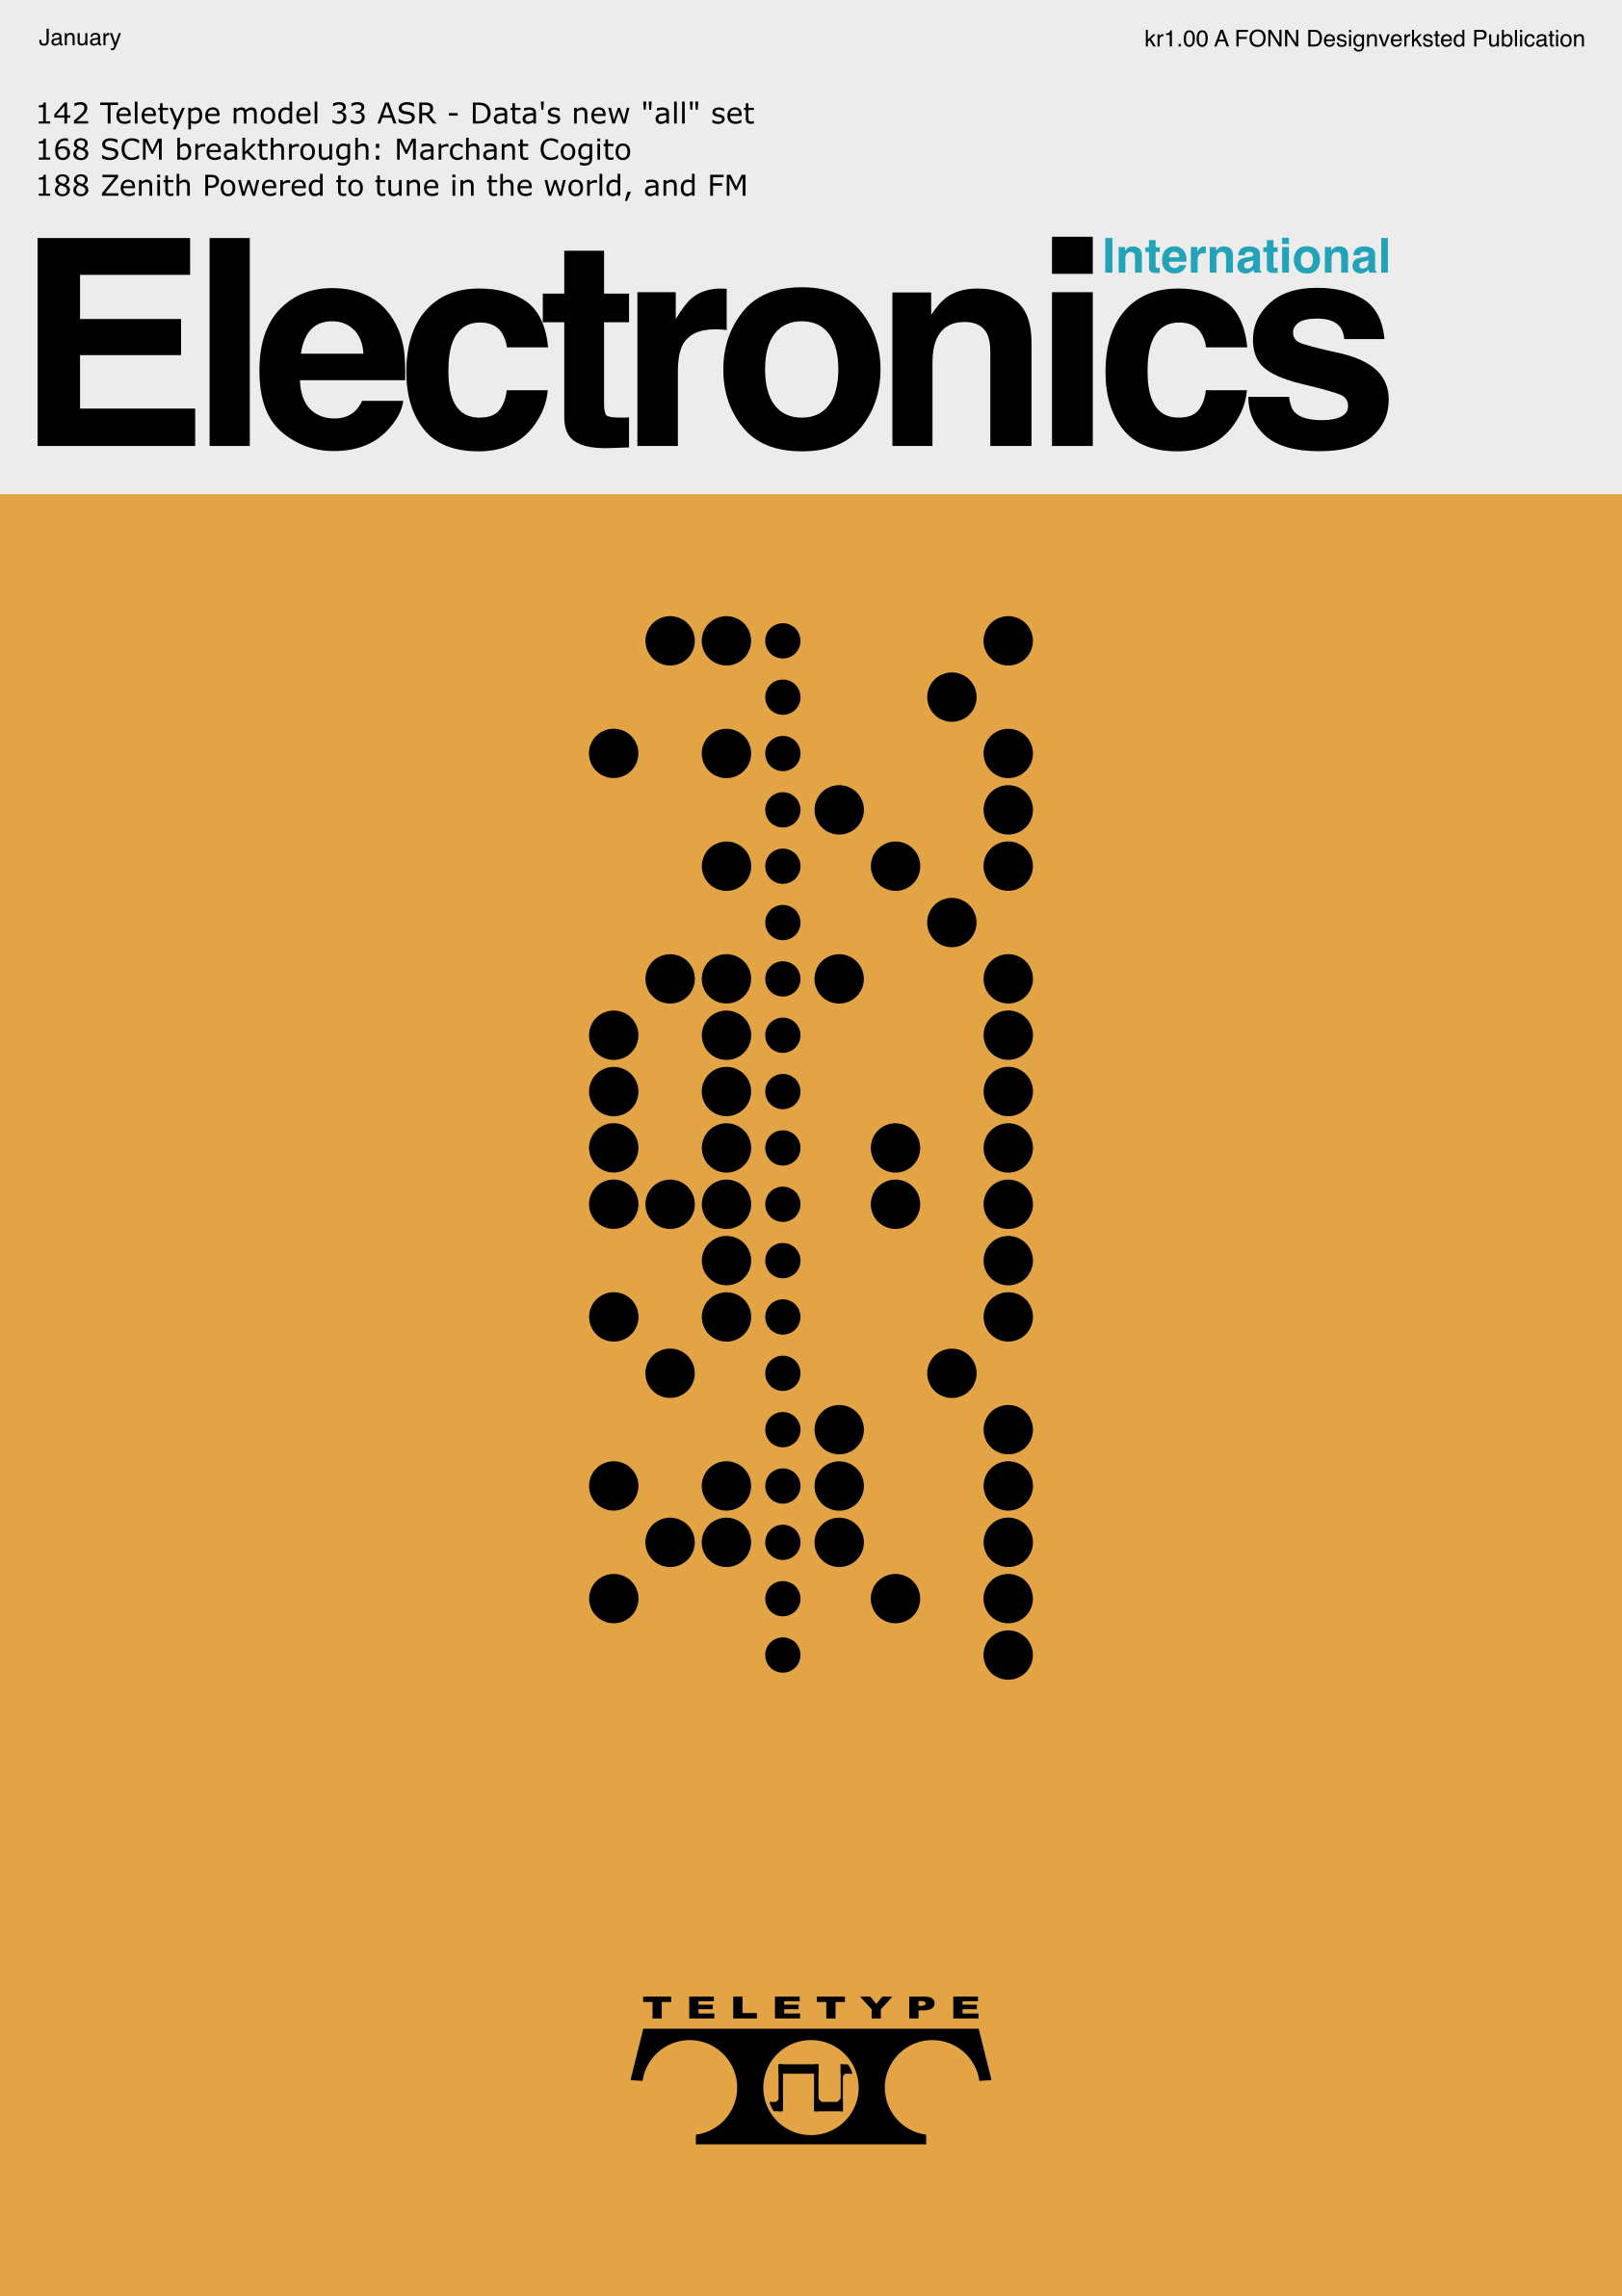 teletype-33-asr-poster